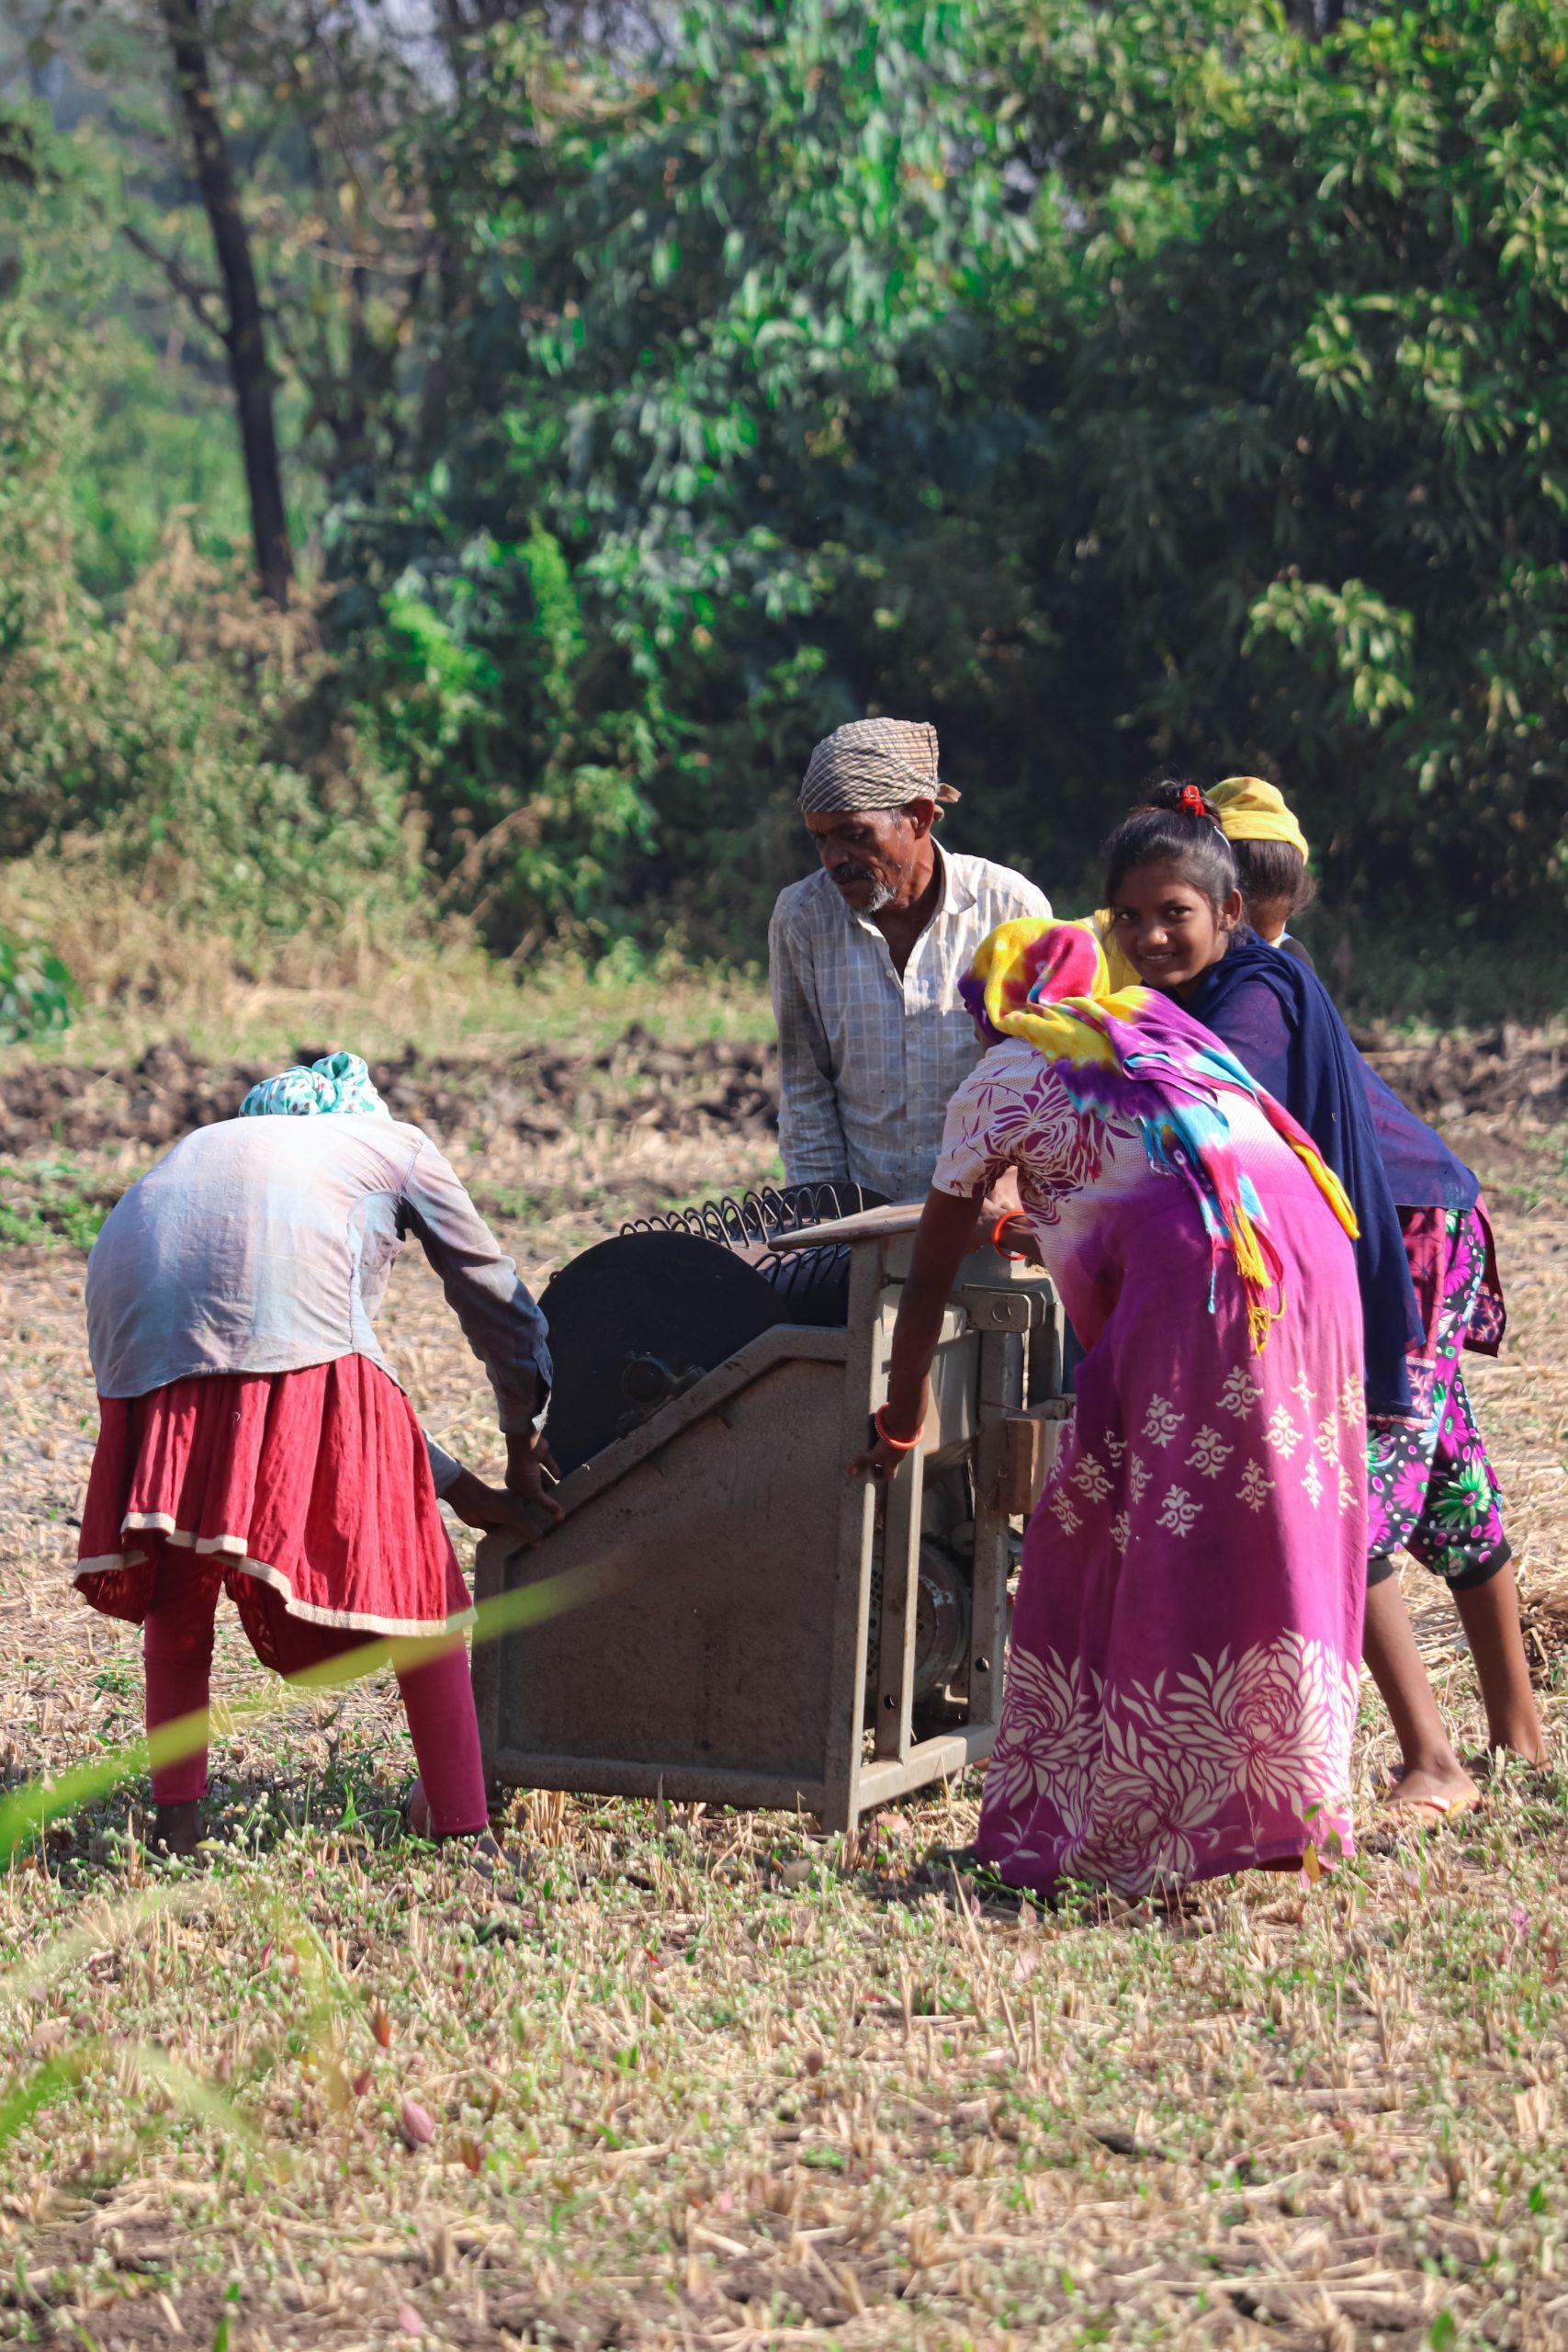 Farmers lifting a machine